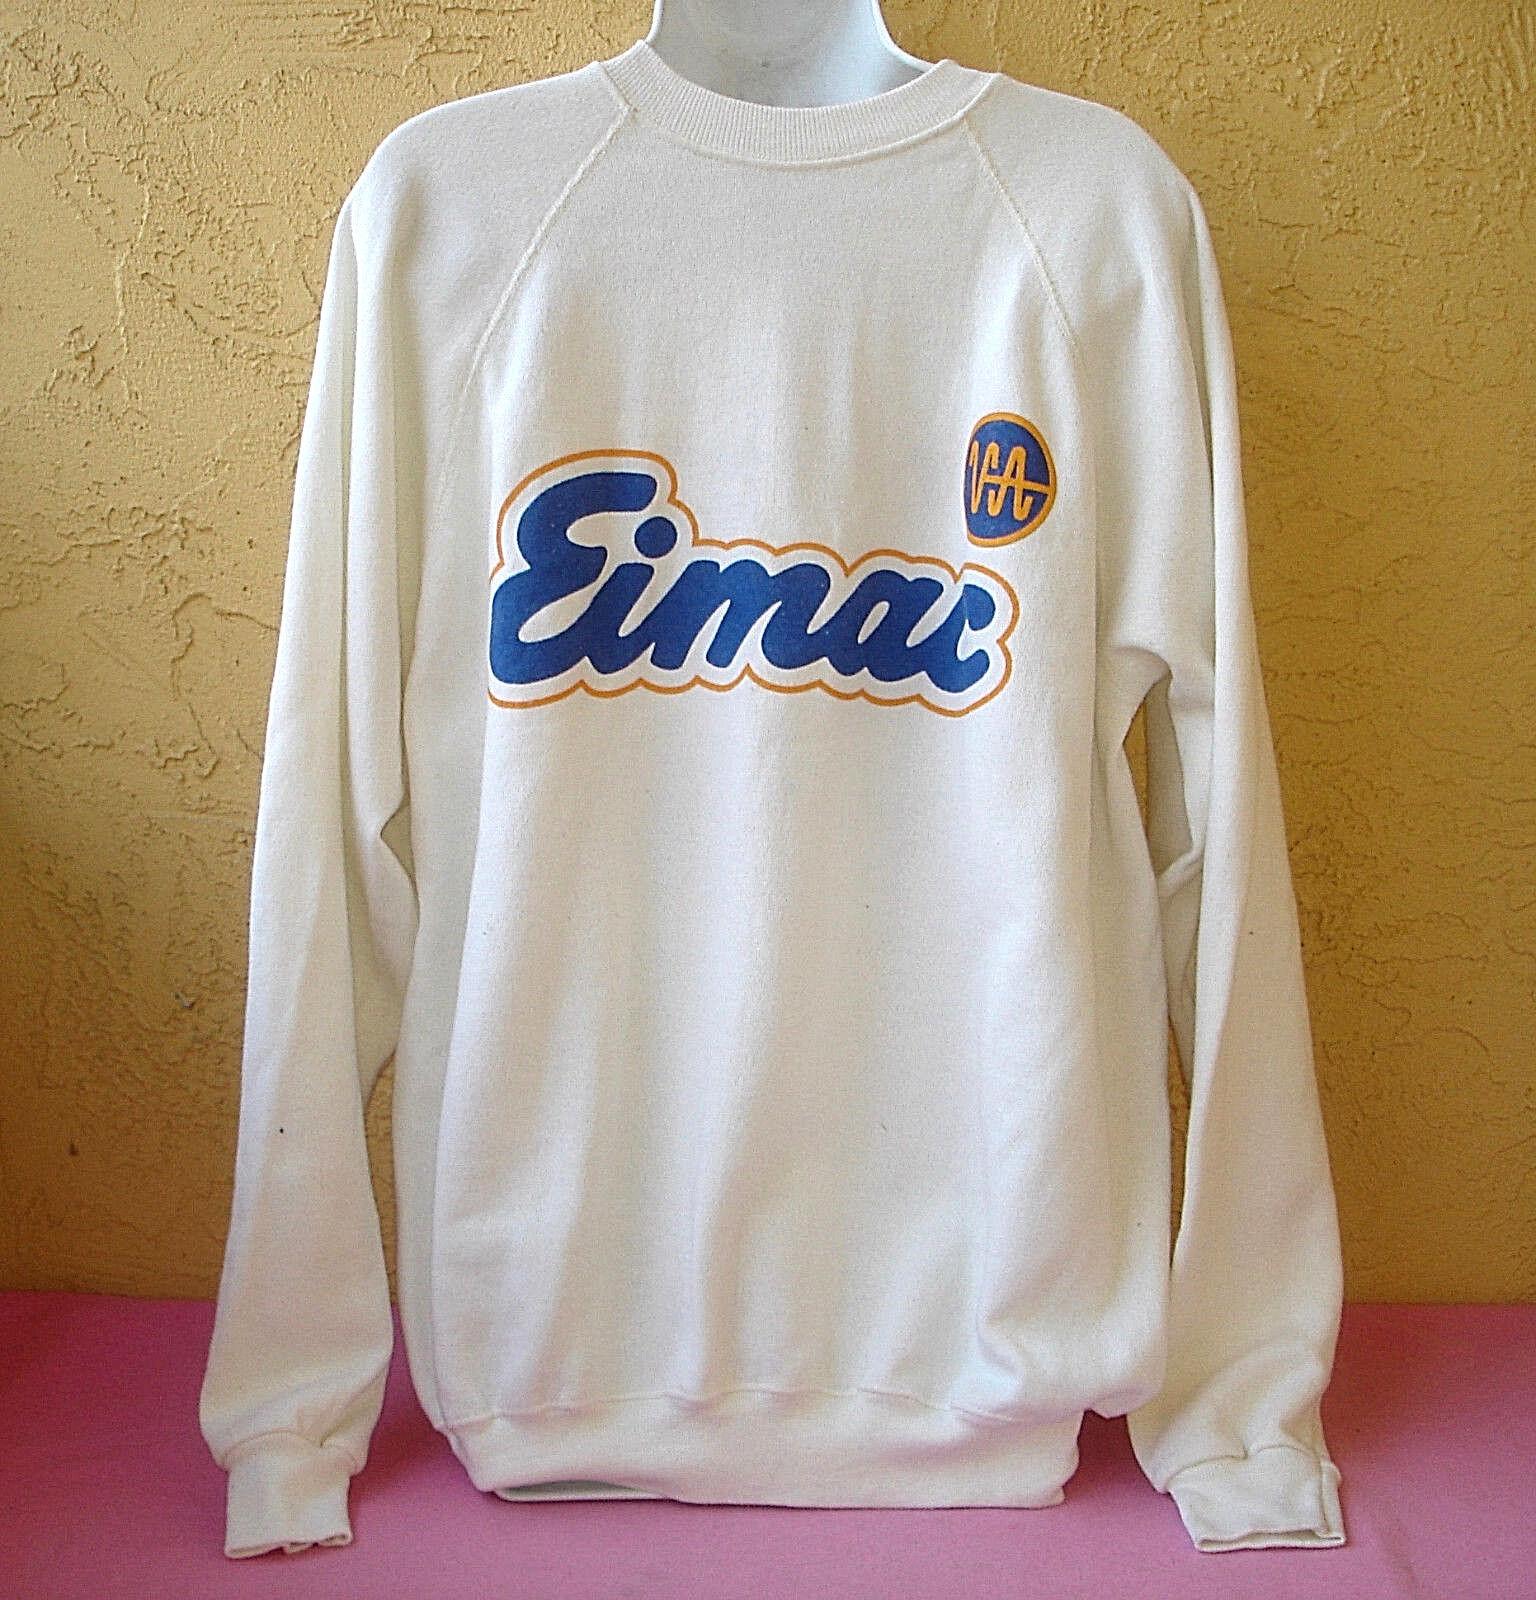 Varian Associates EIMAC Weiß Sweatshirt  XL  Vacuum Tubes Radio Frequency Men